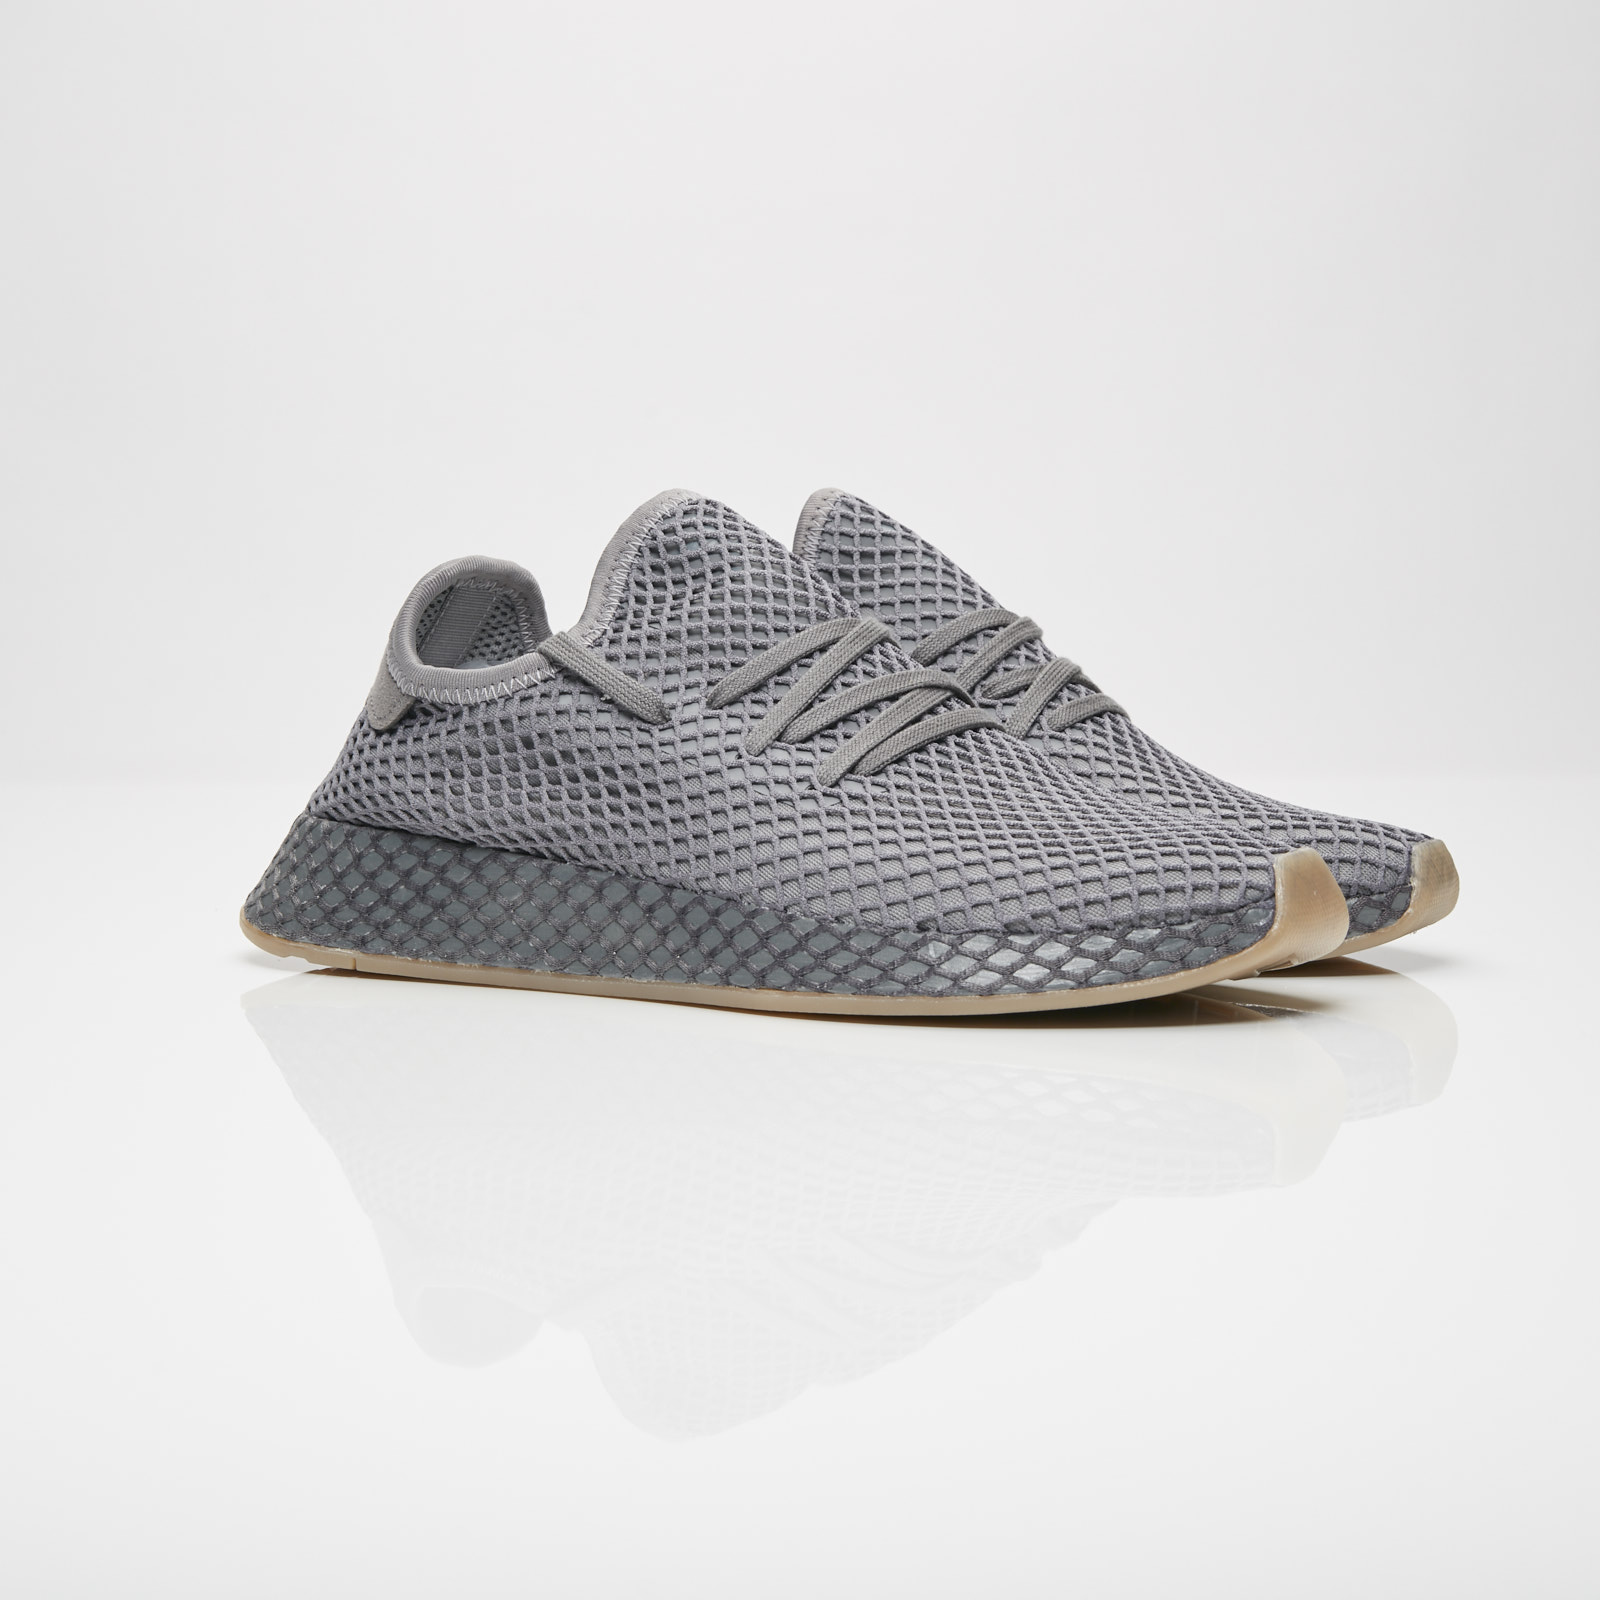 finest selection 1a8b8 6eccb Runner Cq2627 Adidas Sneakersnstuff Deerupt Sneakers Swxq57F